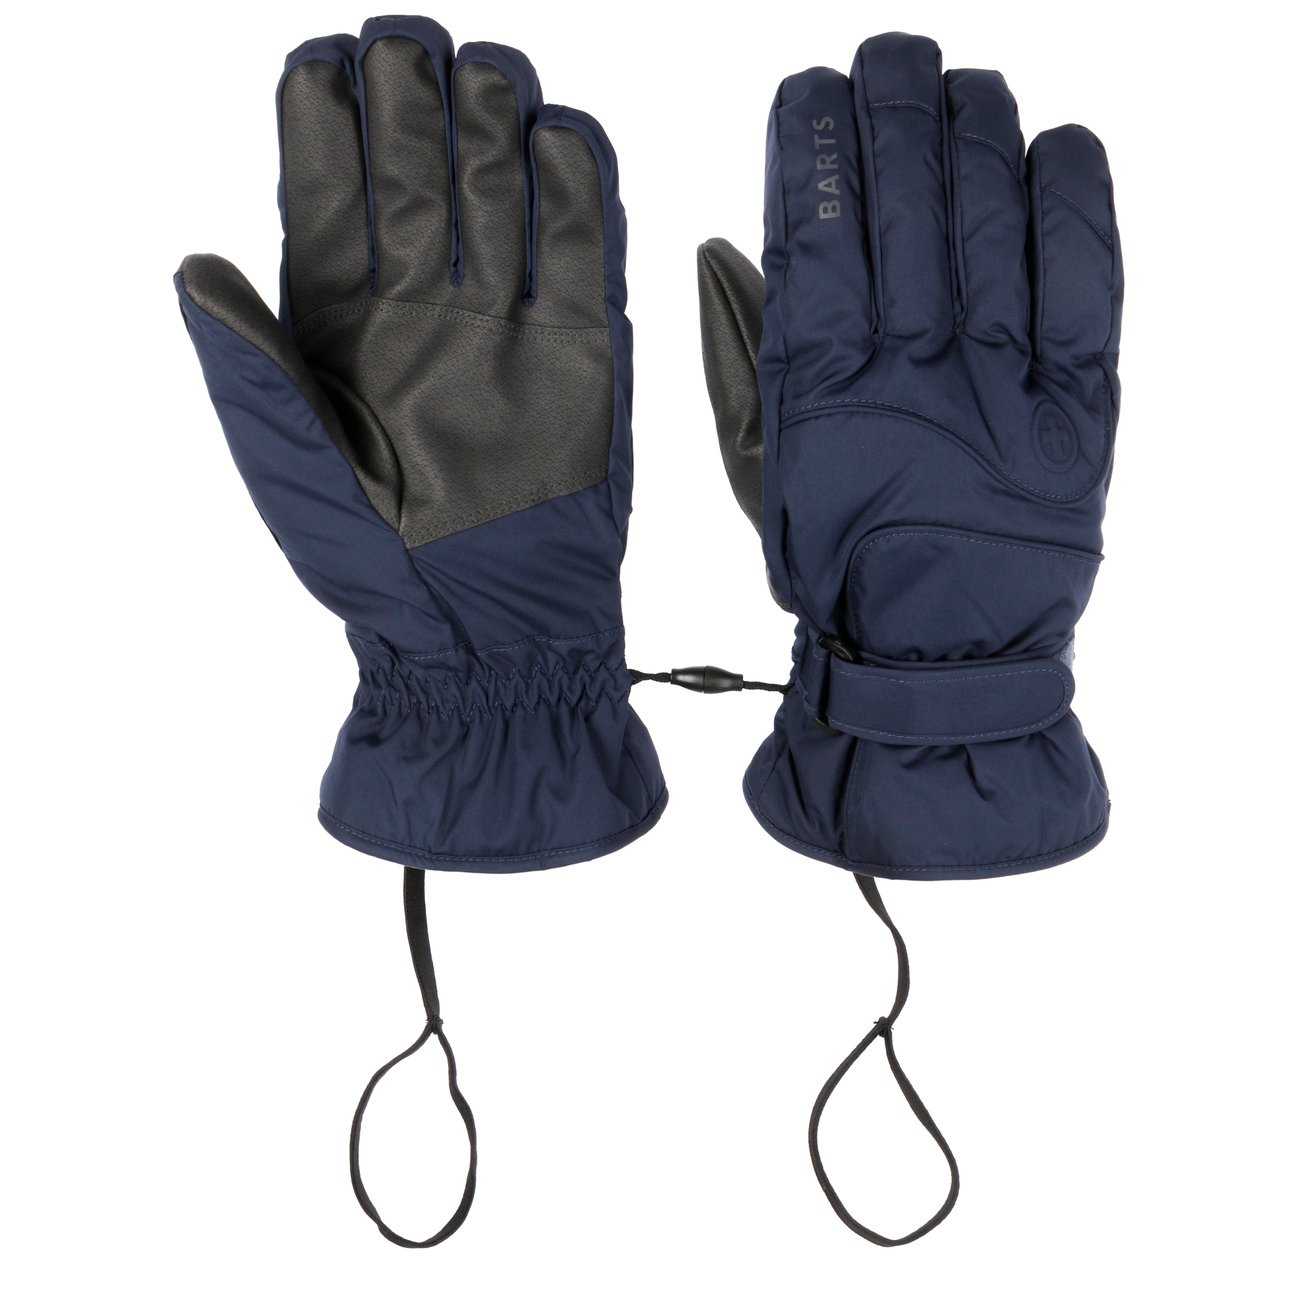 Basic Winterhandschuhe by Barts